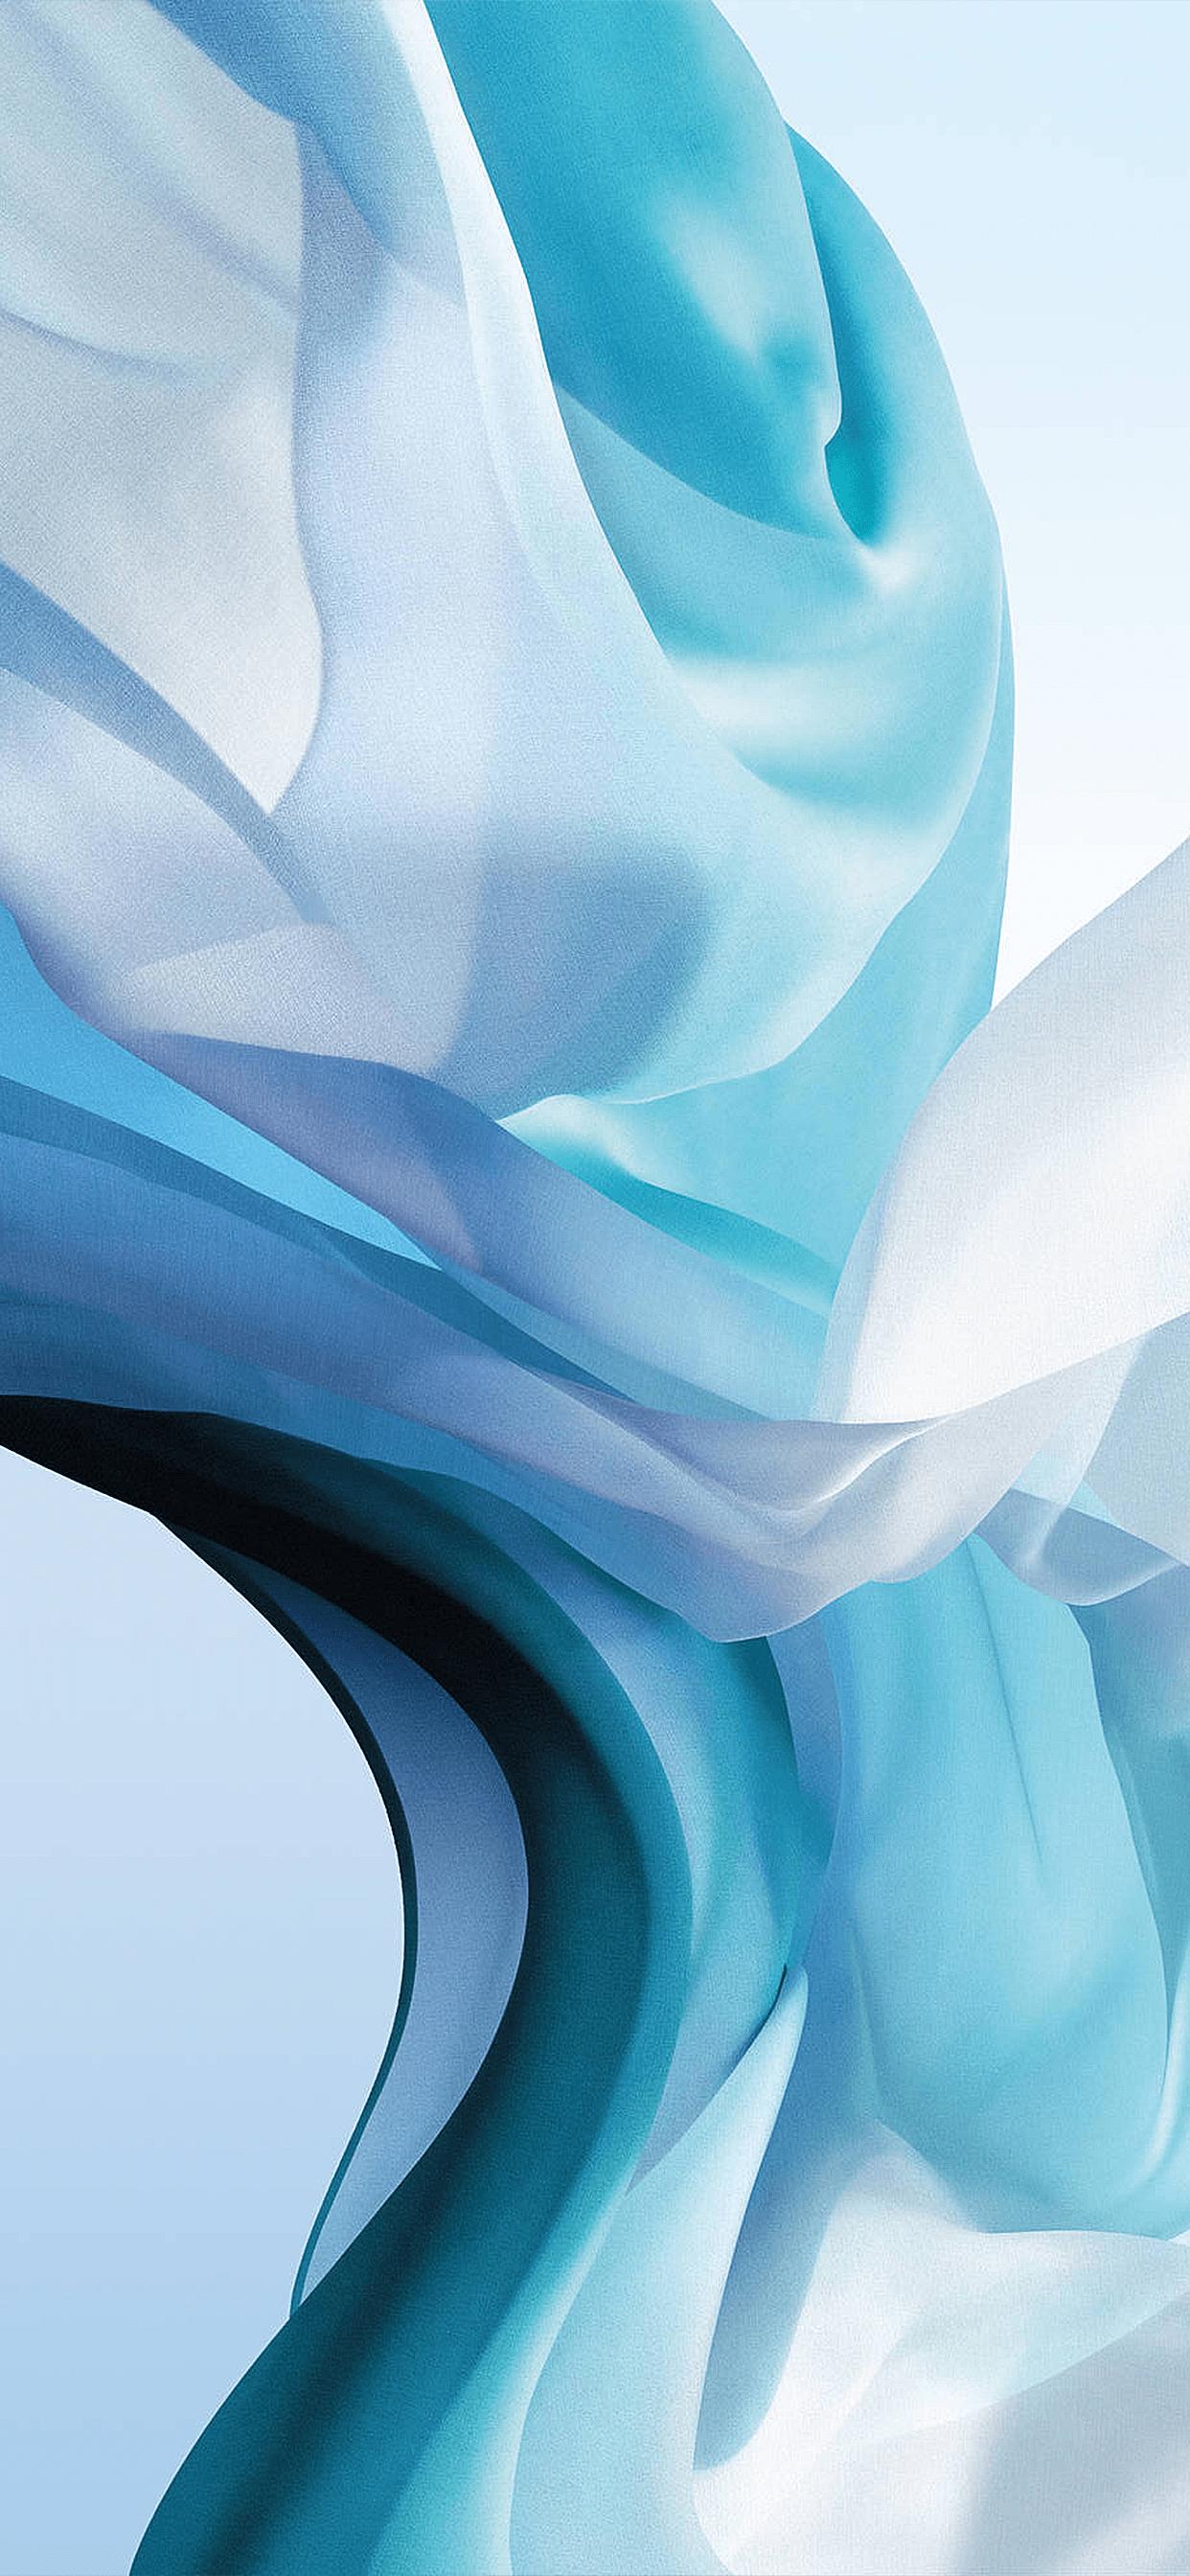 Download Apple Macbook Air 2018 wallpapers [1242 x 2688